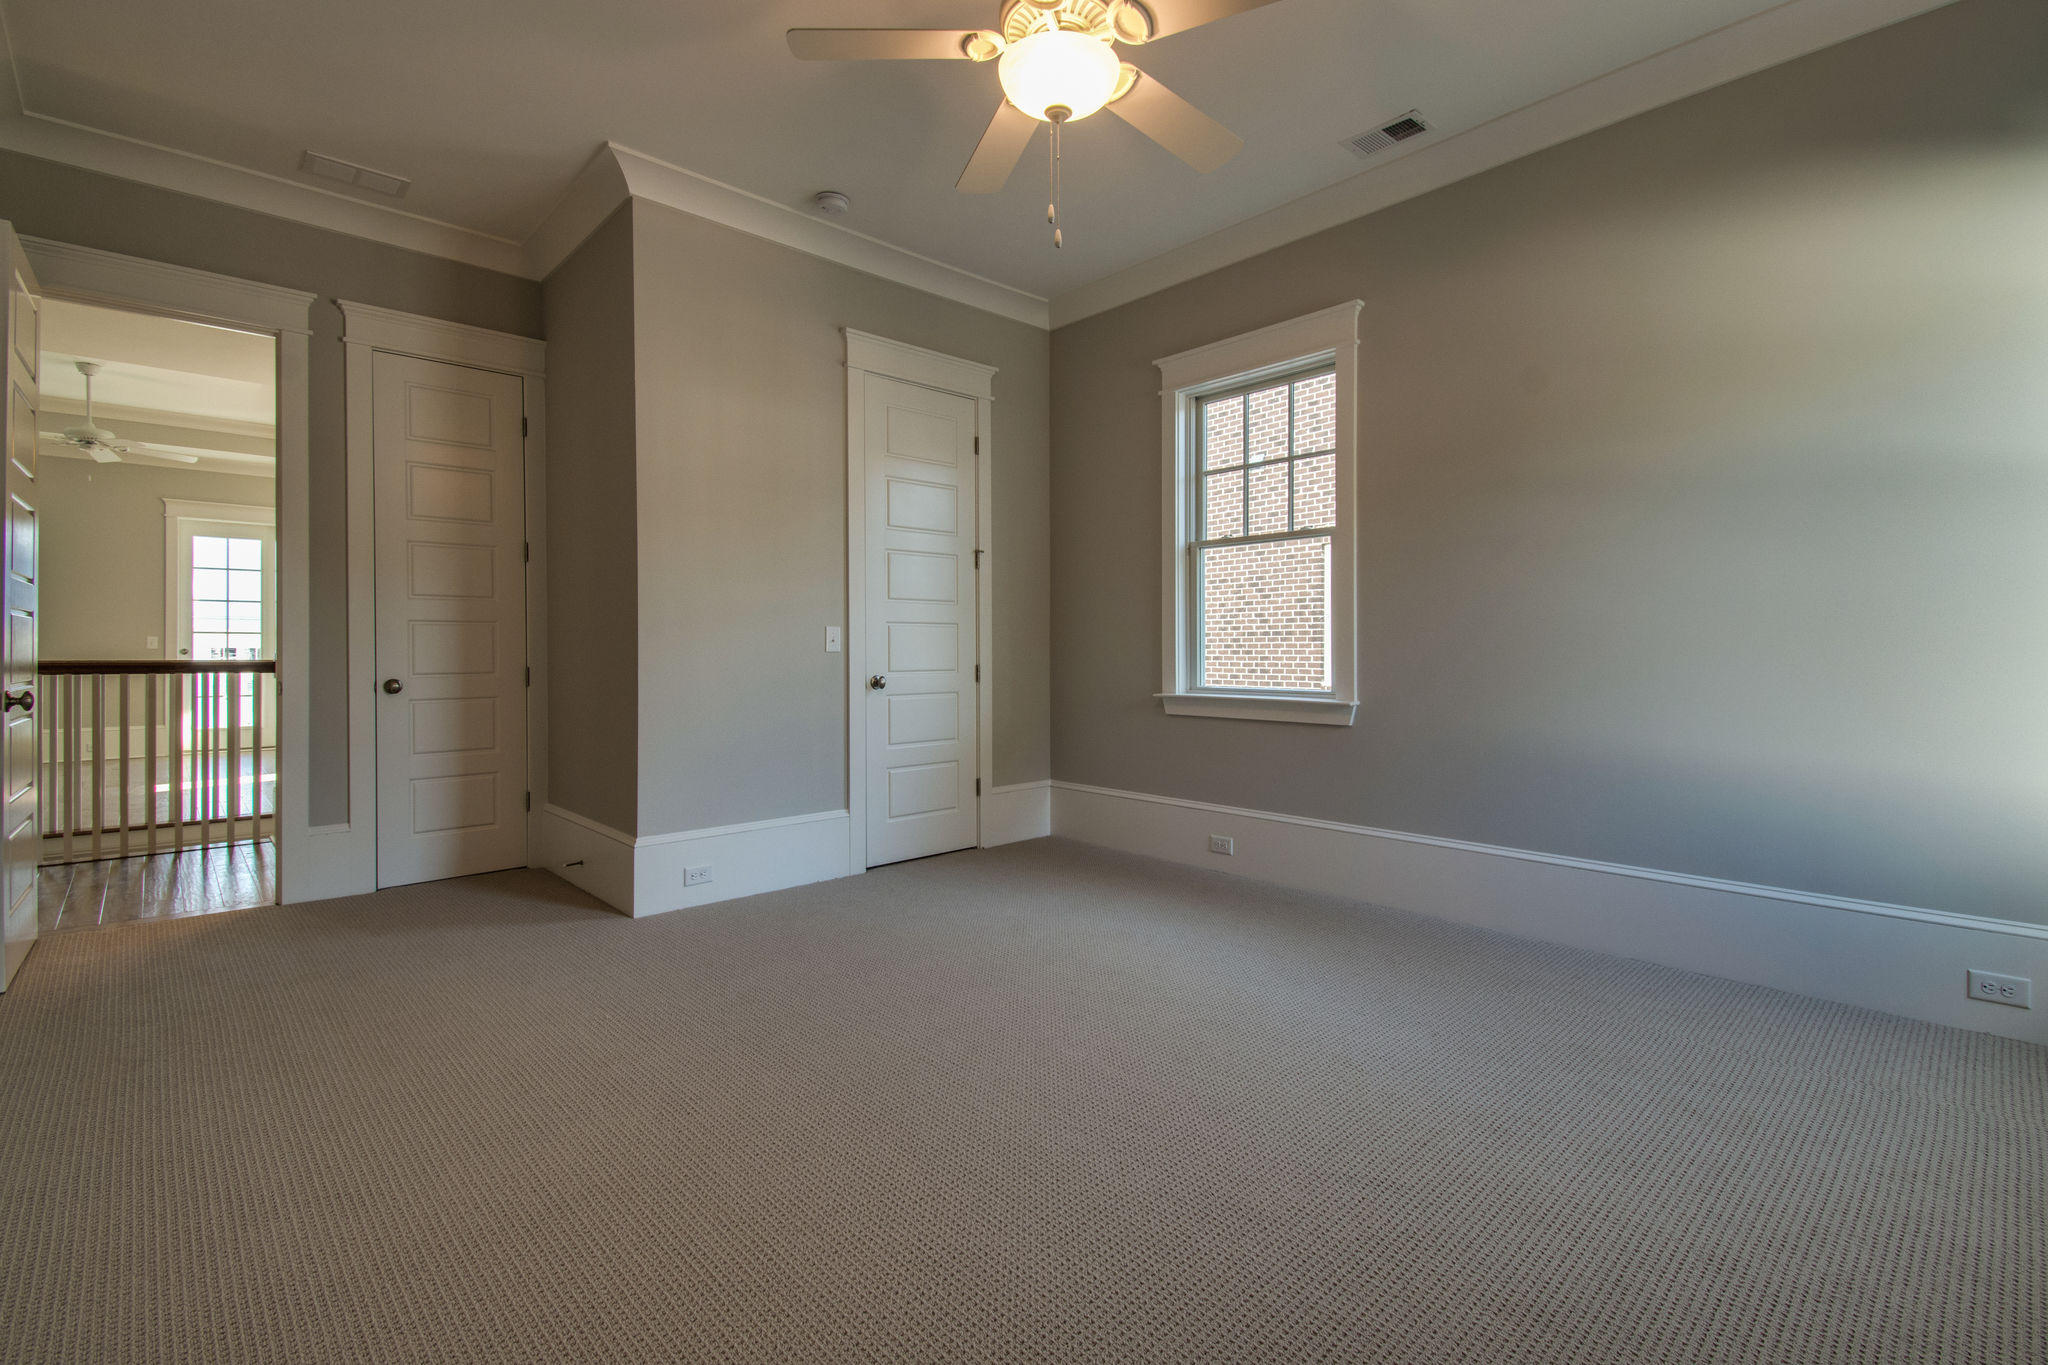 Daniel Island Park Homes For Sale - 112 Brailsford, Charleston, SC - 10